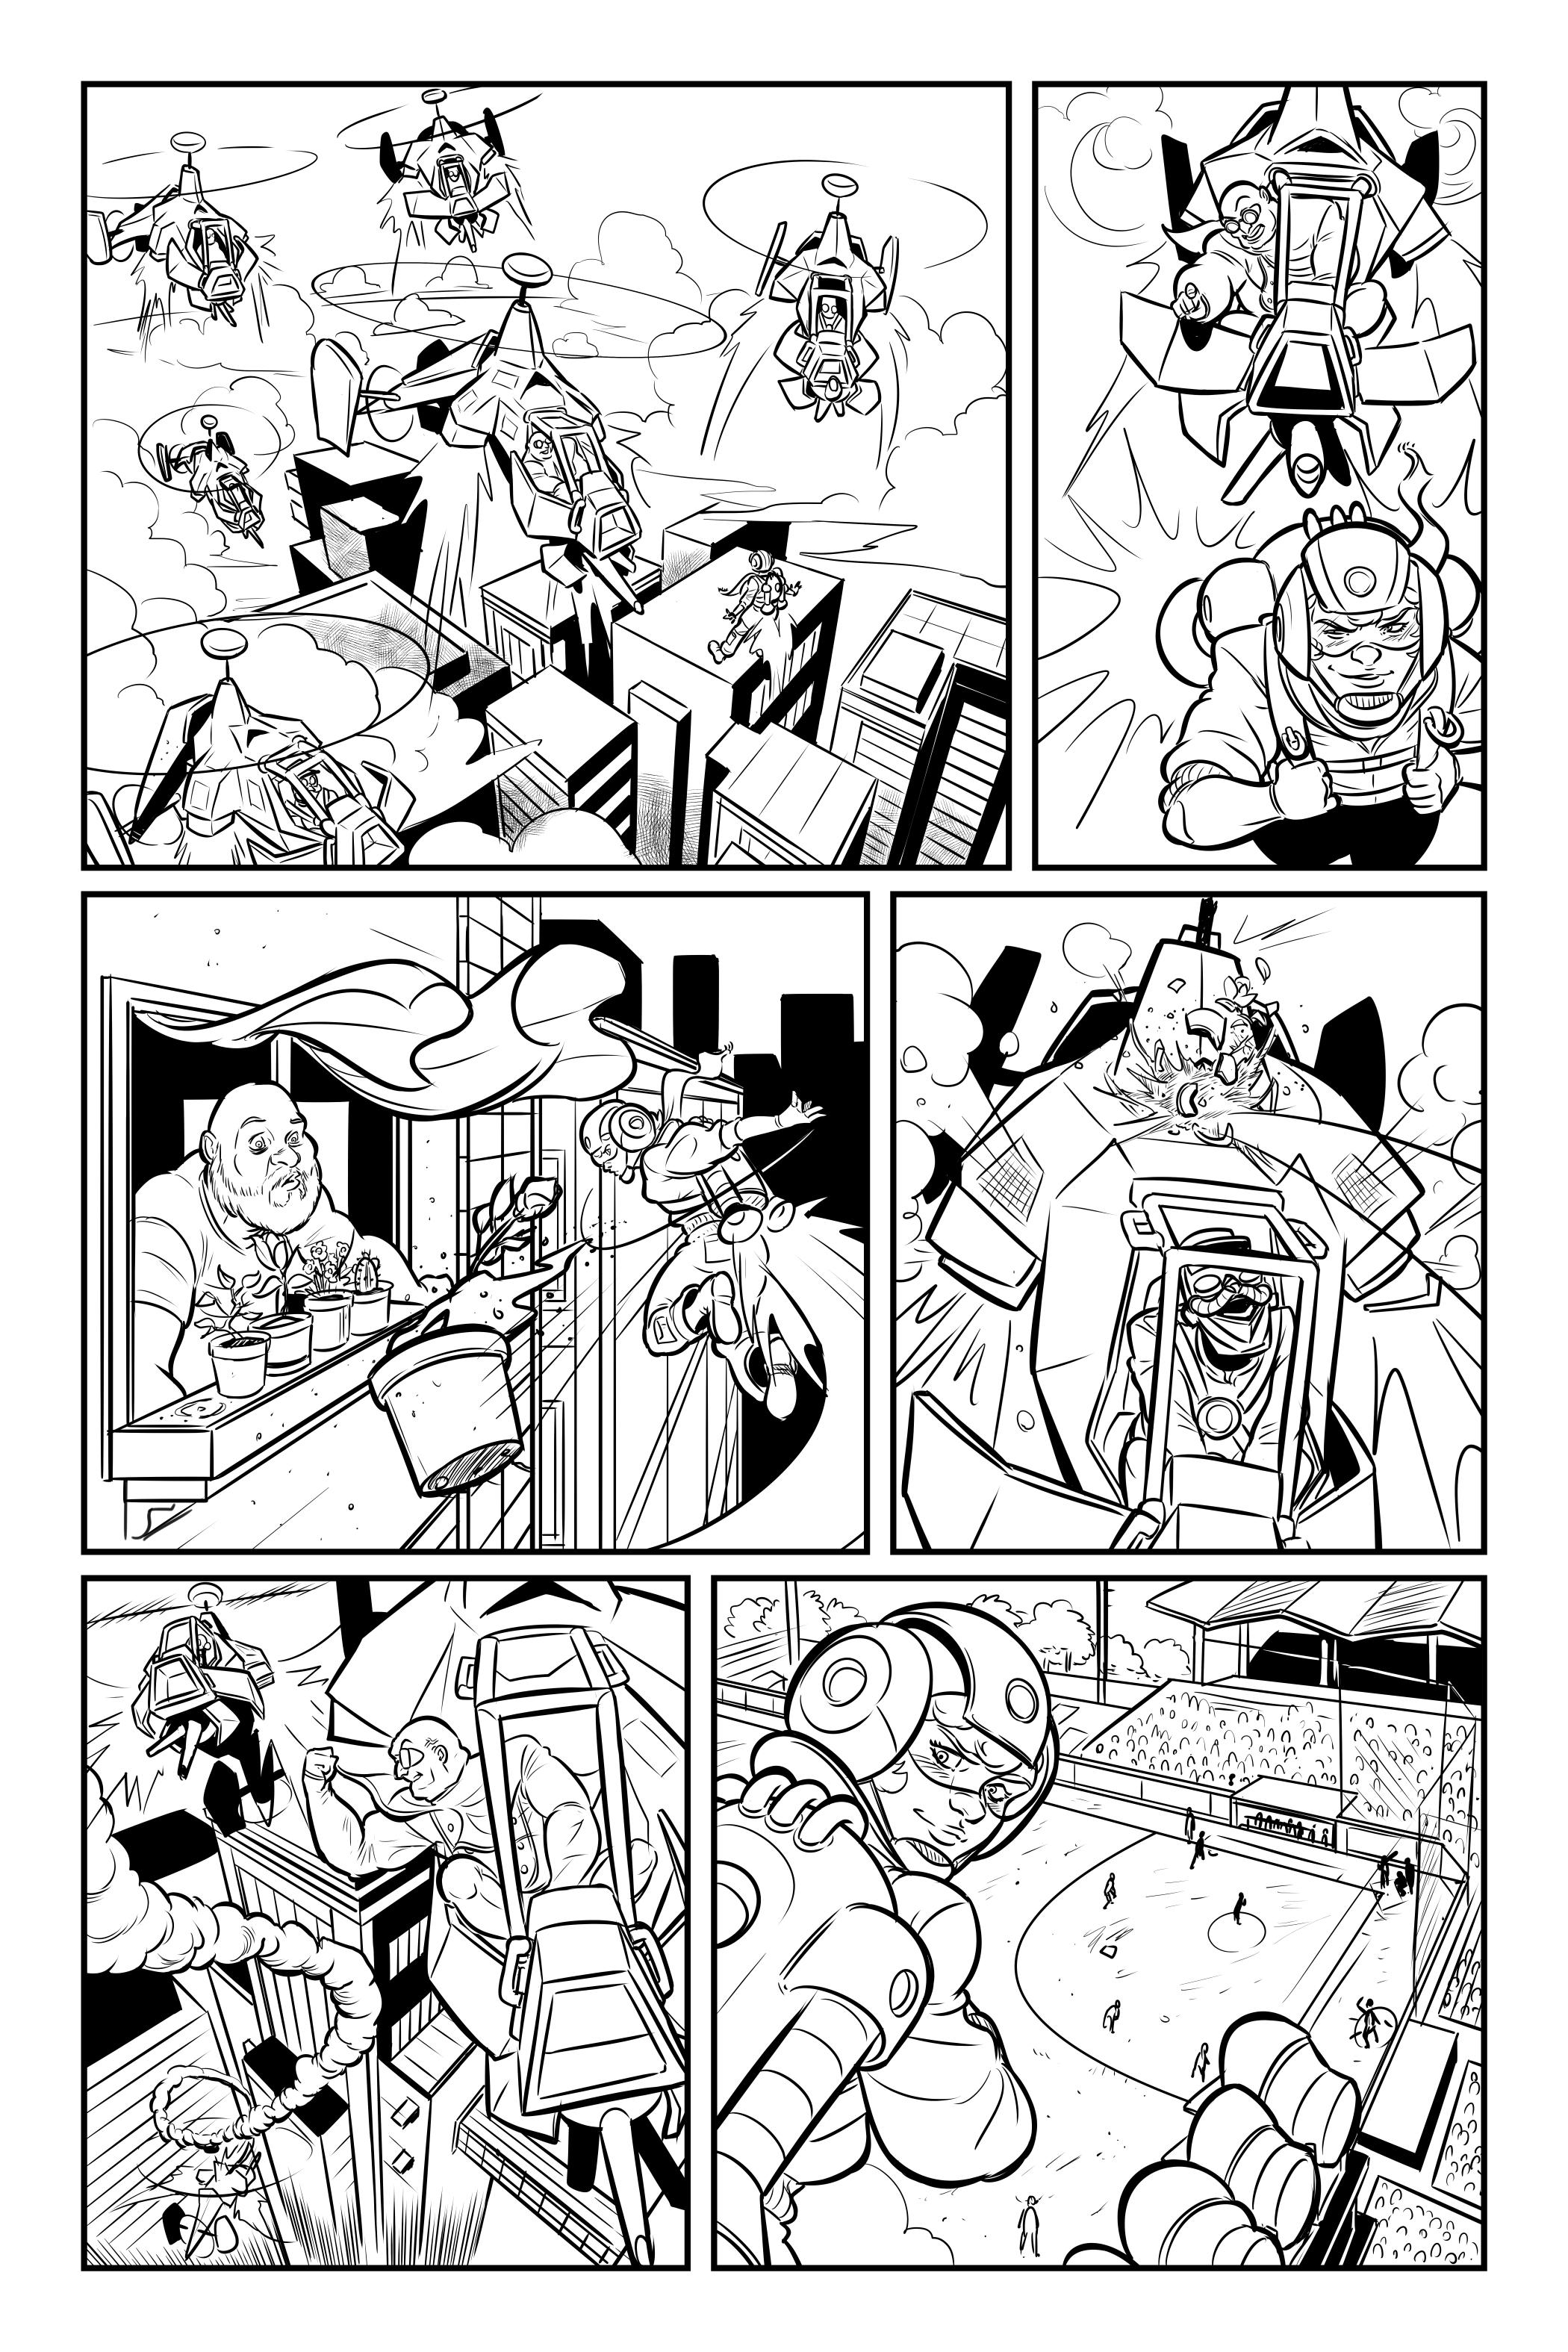 JJ Issue 5 pg 1 copy.jpg